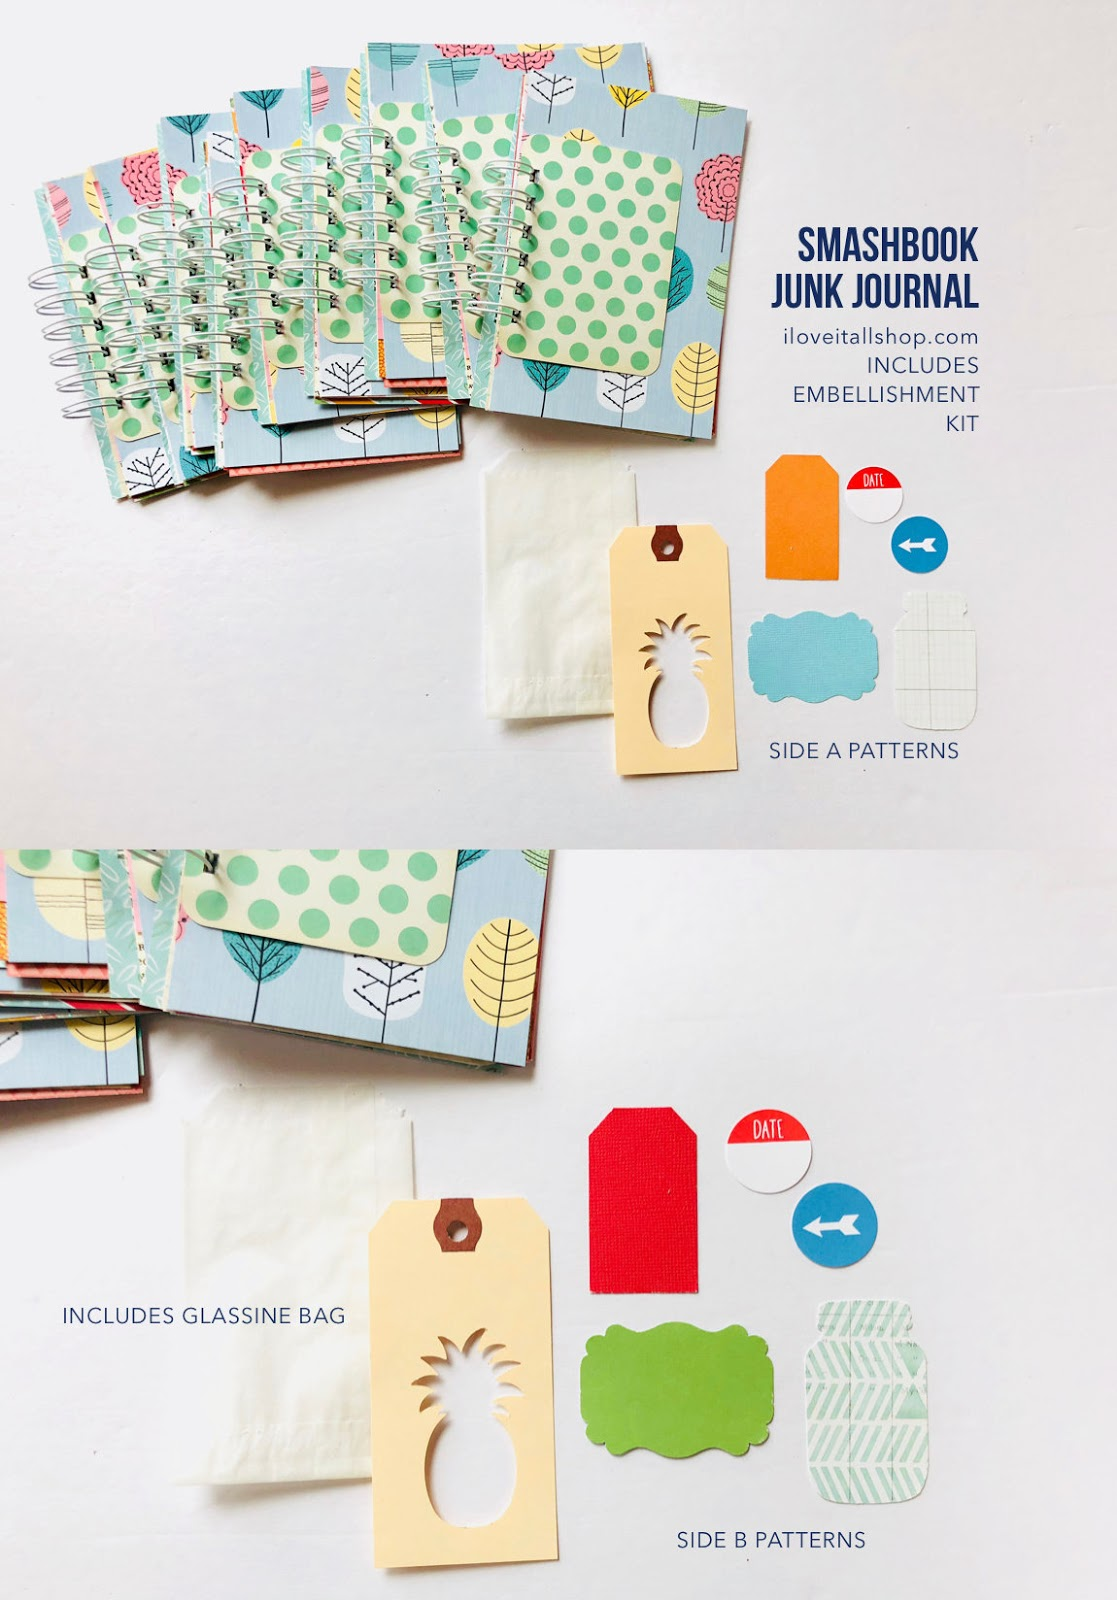 #30lists #journals #mini books #smashbook #mini album #notebooks #mixed media journals #instagram journal #gratitude journal